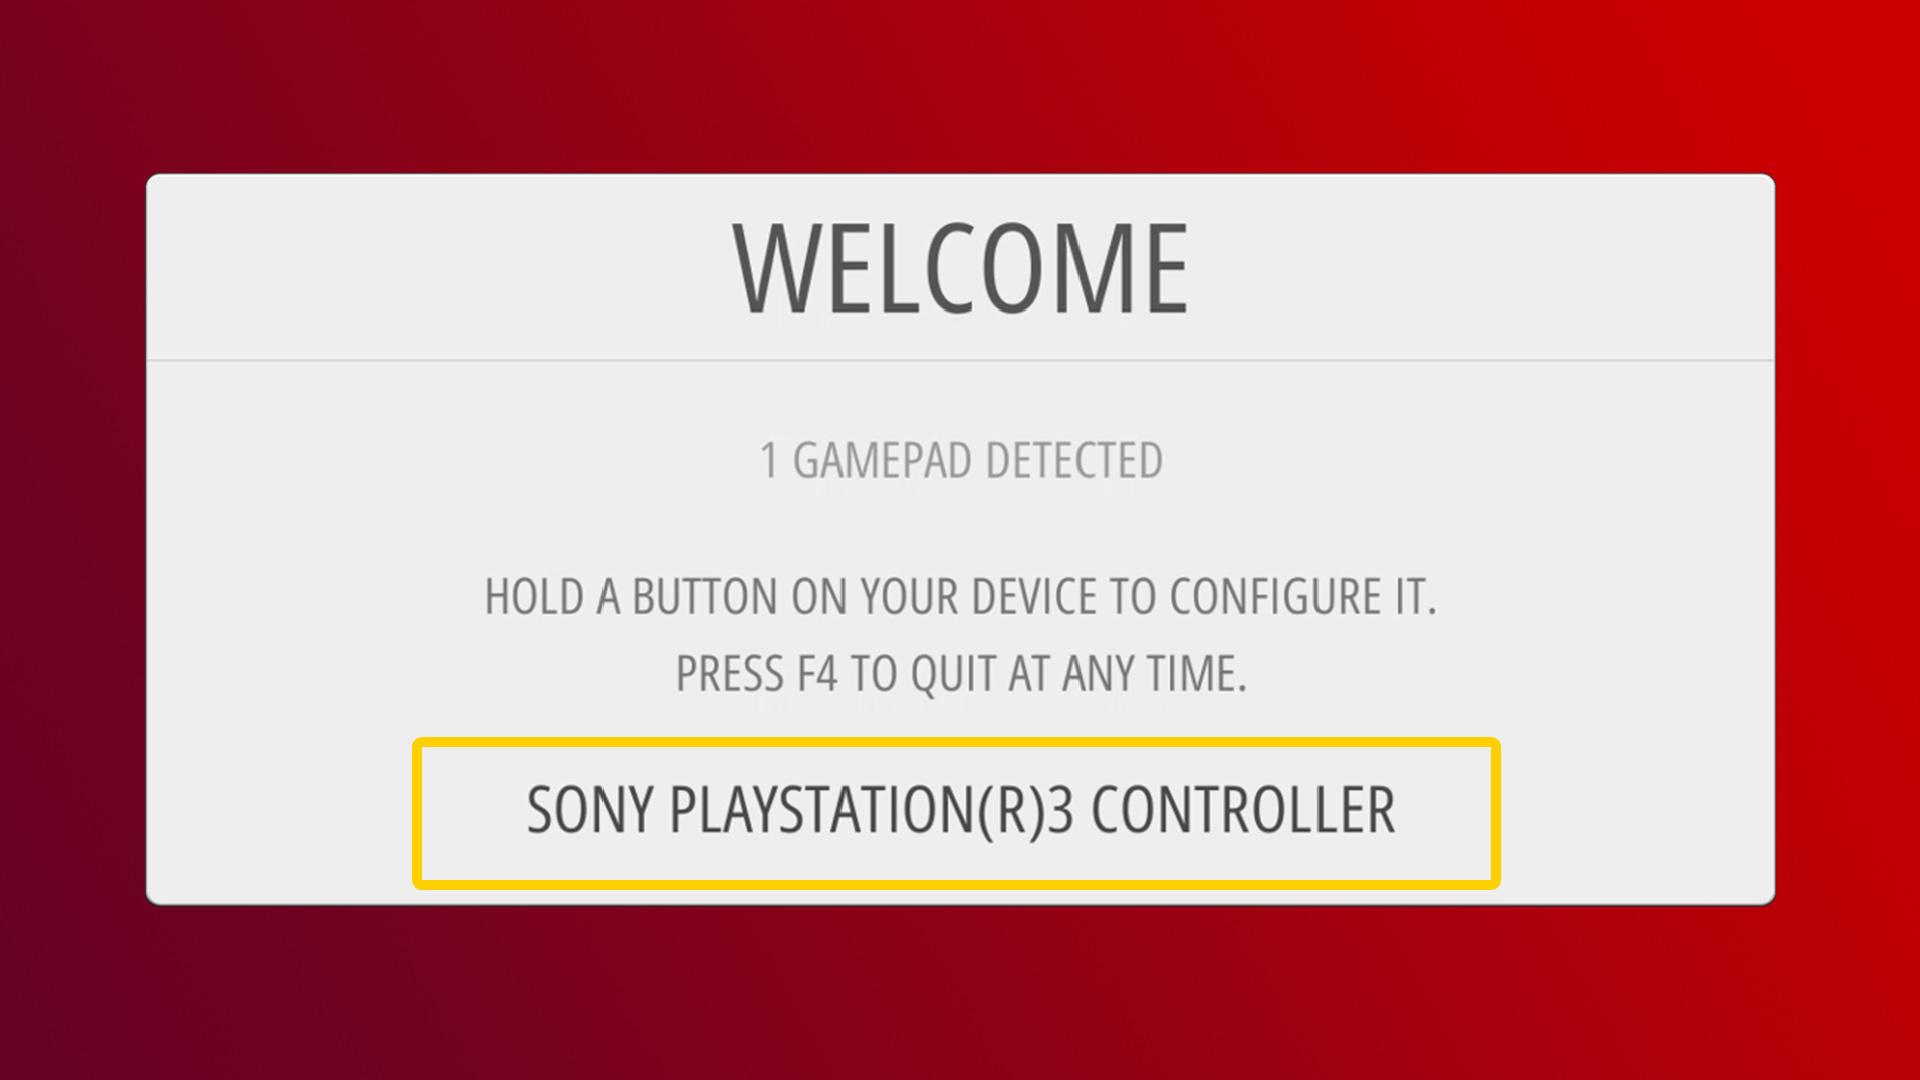 DigitaleWelt RetroPie Anleitung - Controller hinzufügen